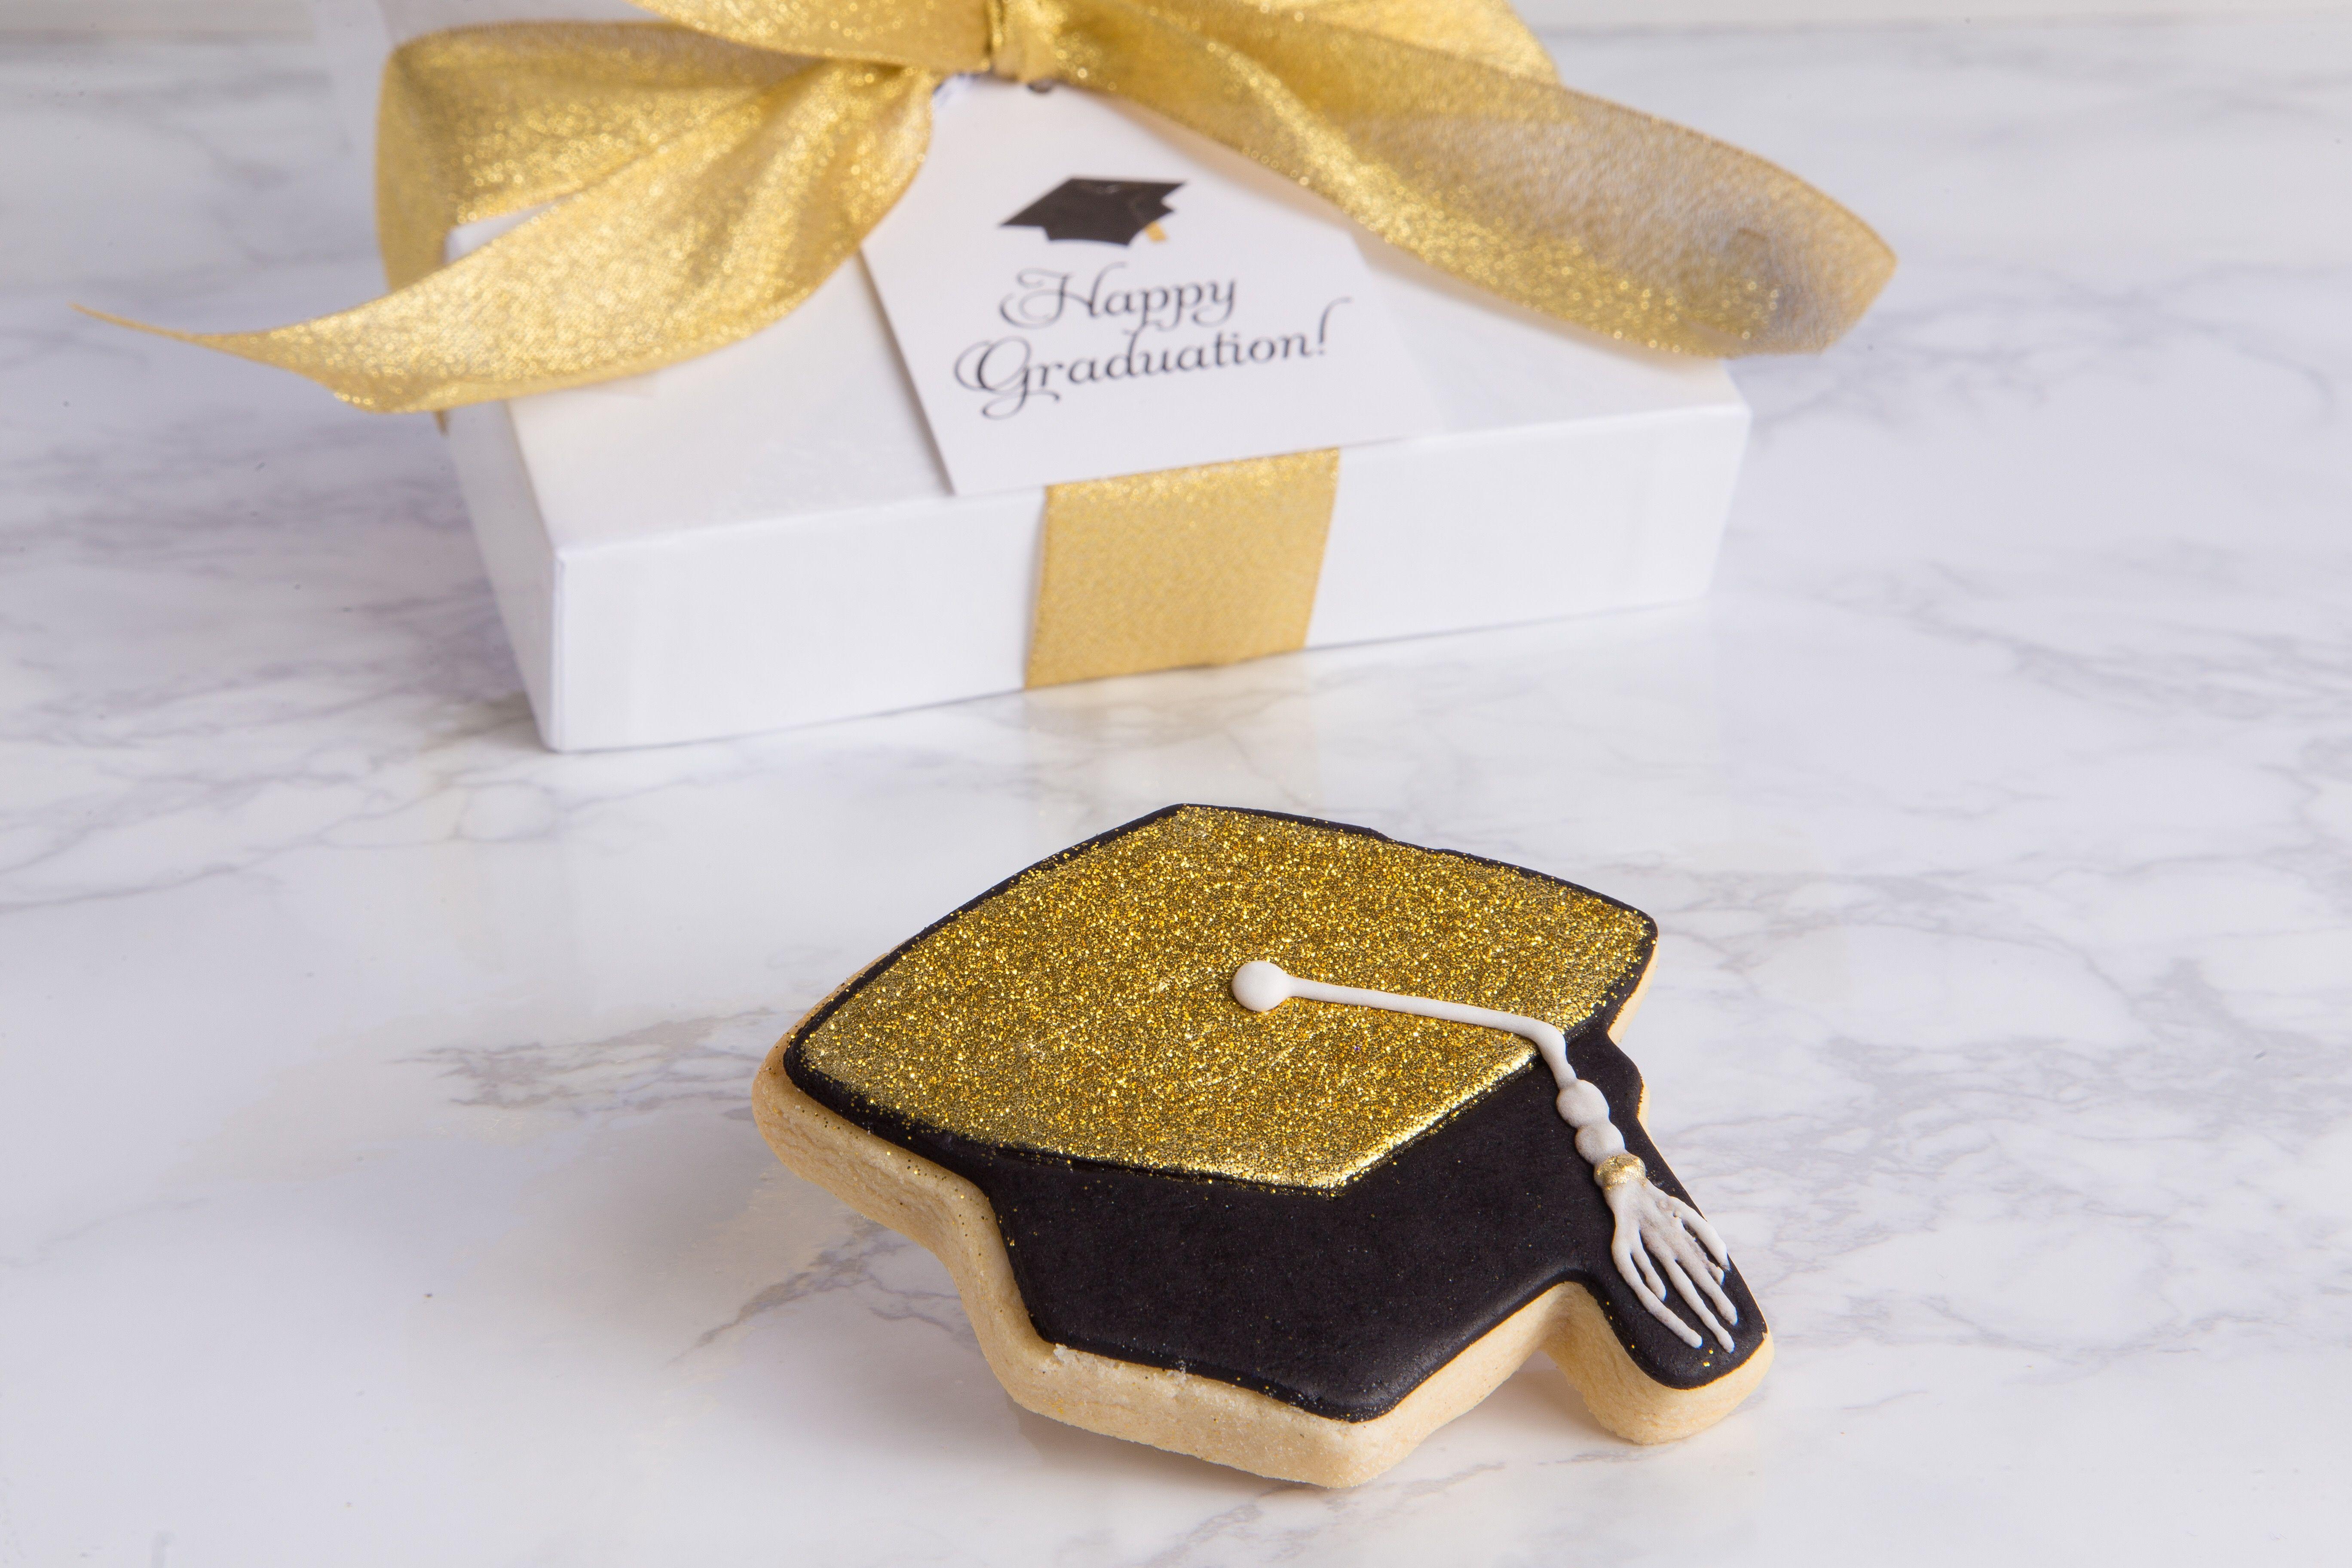 Graduation Single Cookie Gift Box #SweetEs #bakeshop #graduation ...